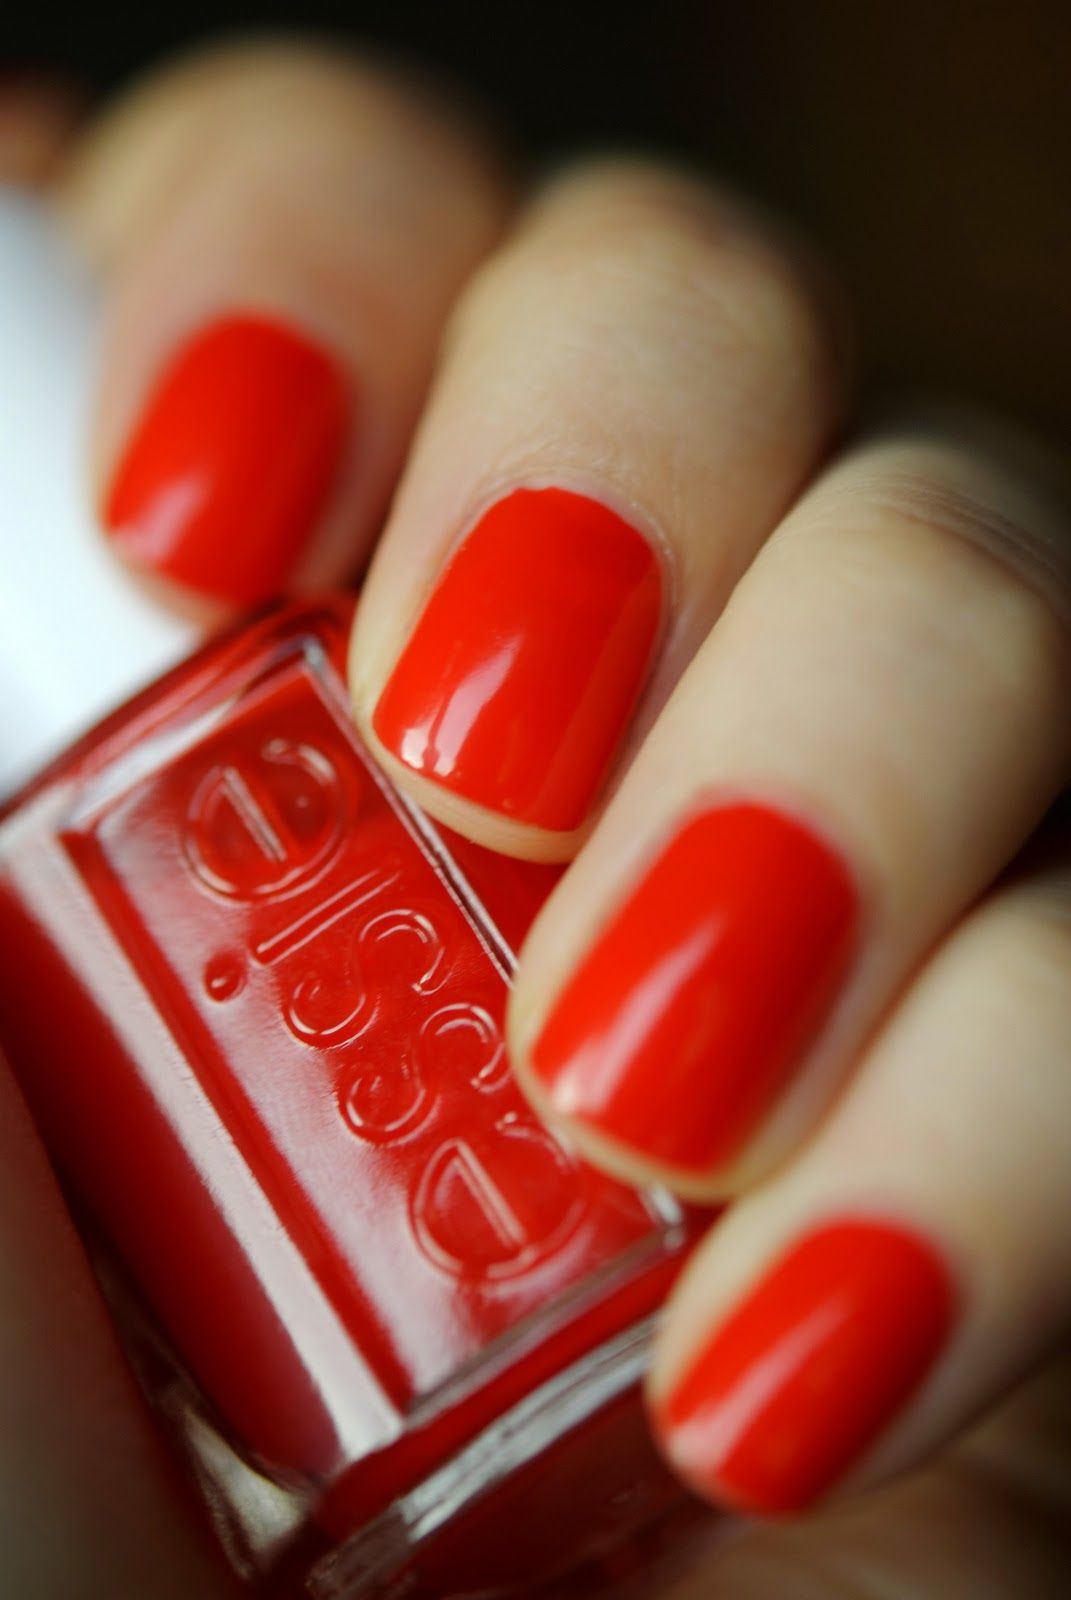 Essie - Clambake (I like this color ALOT) | Beauty and Fashion ...